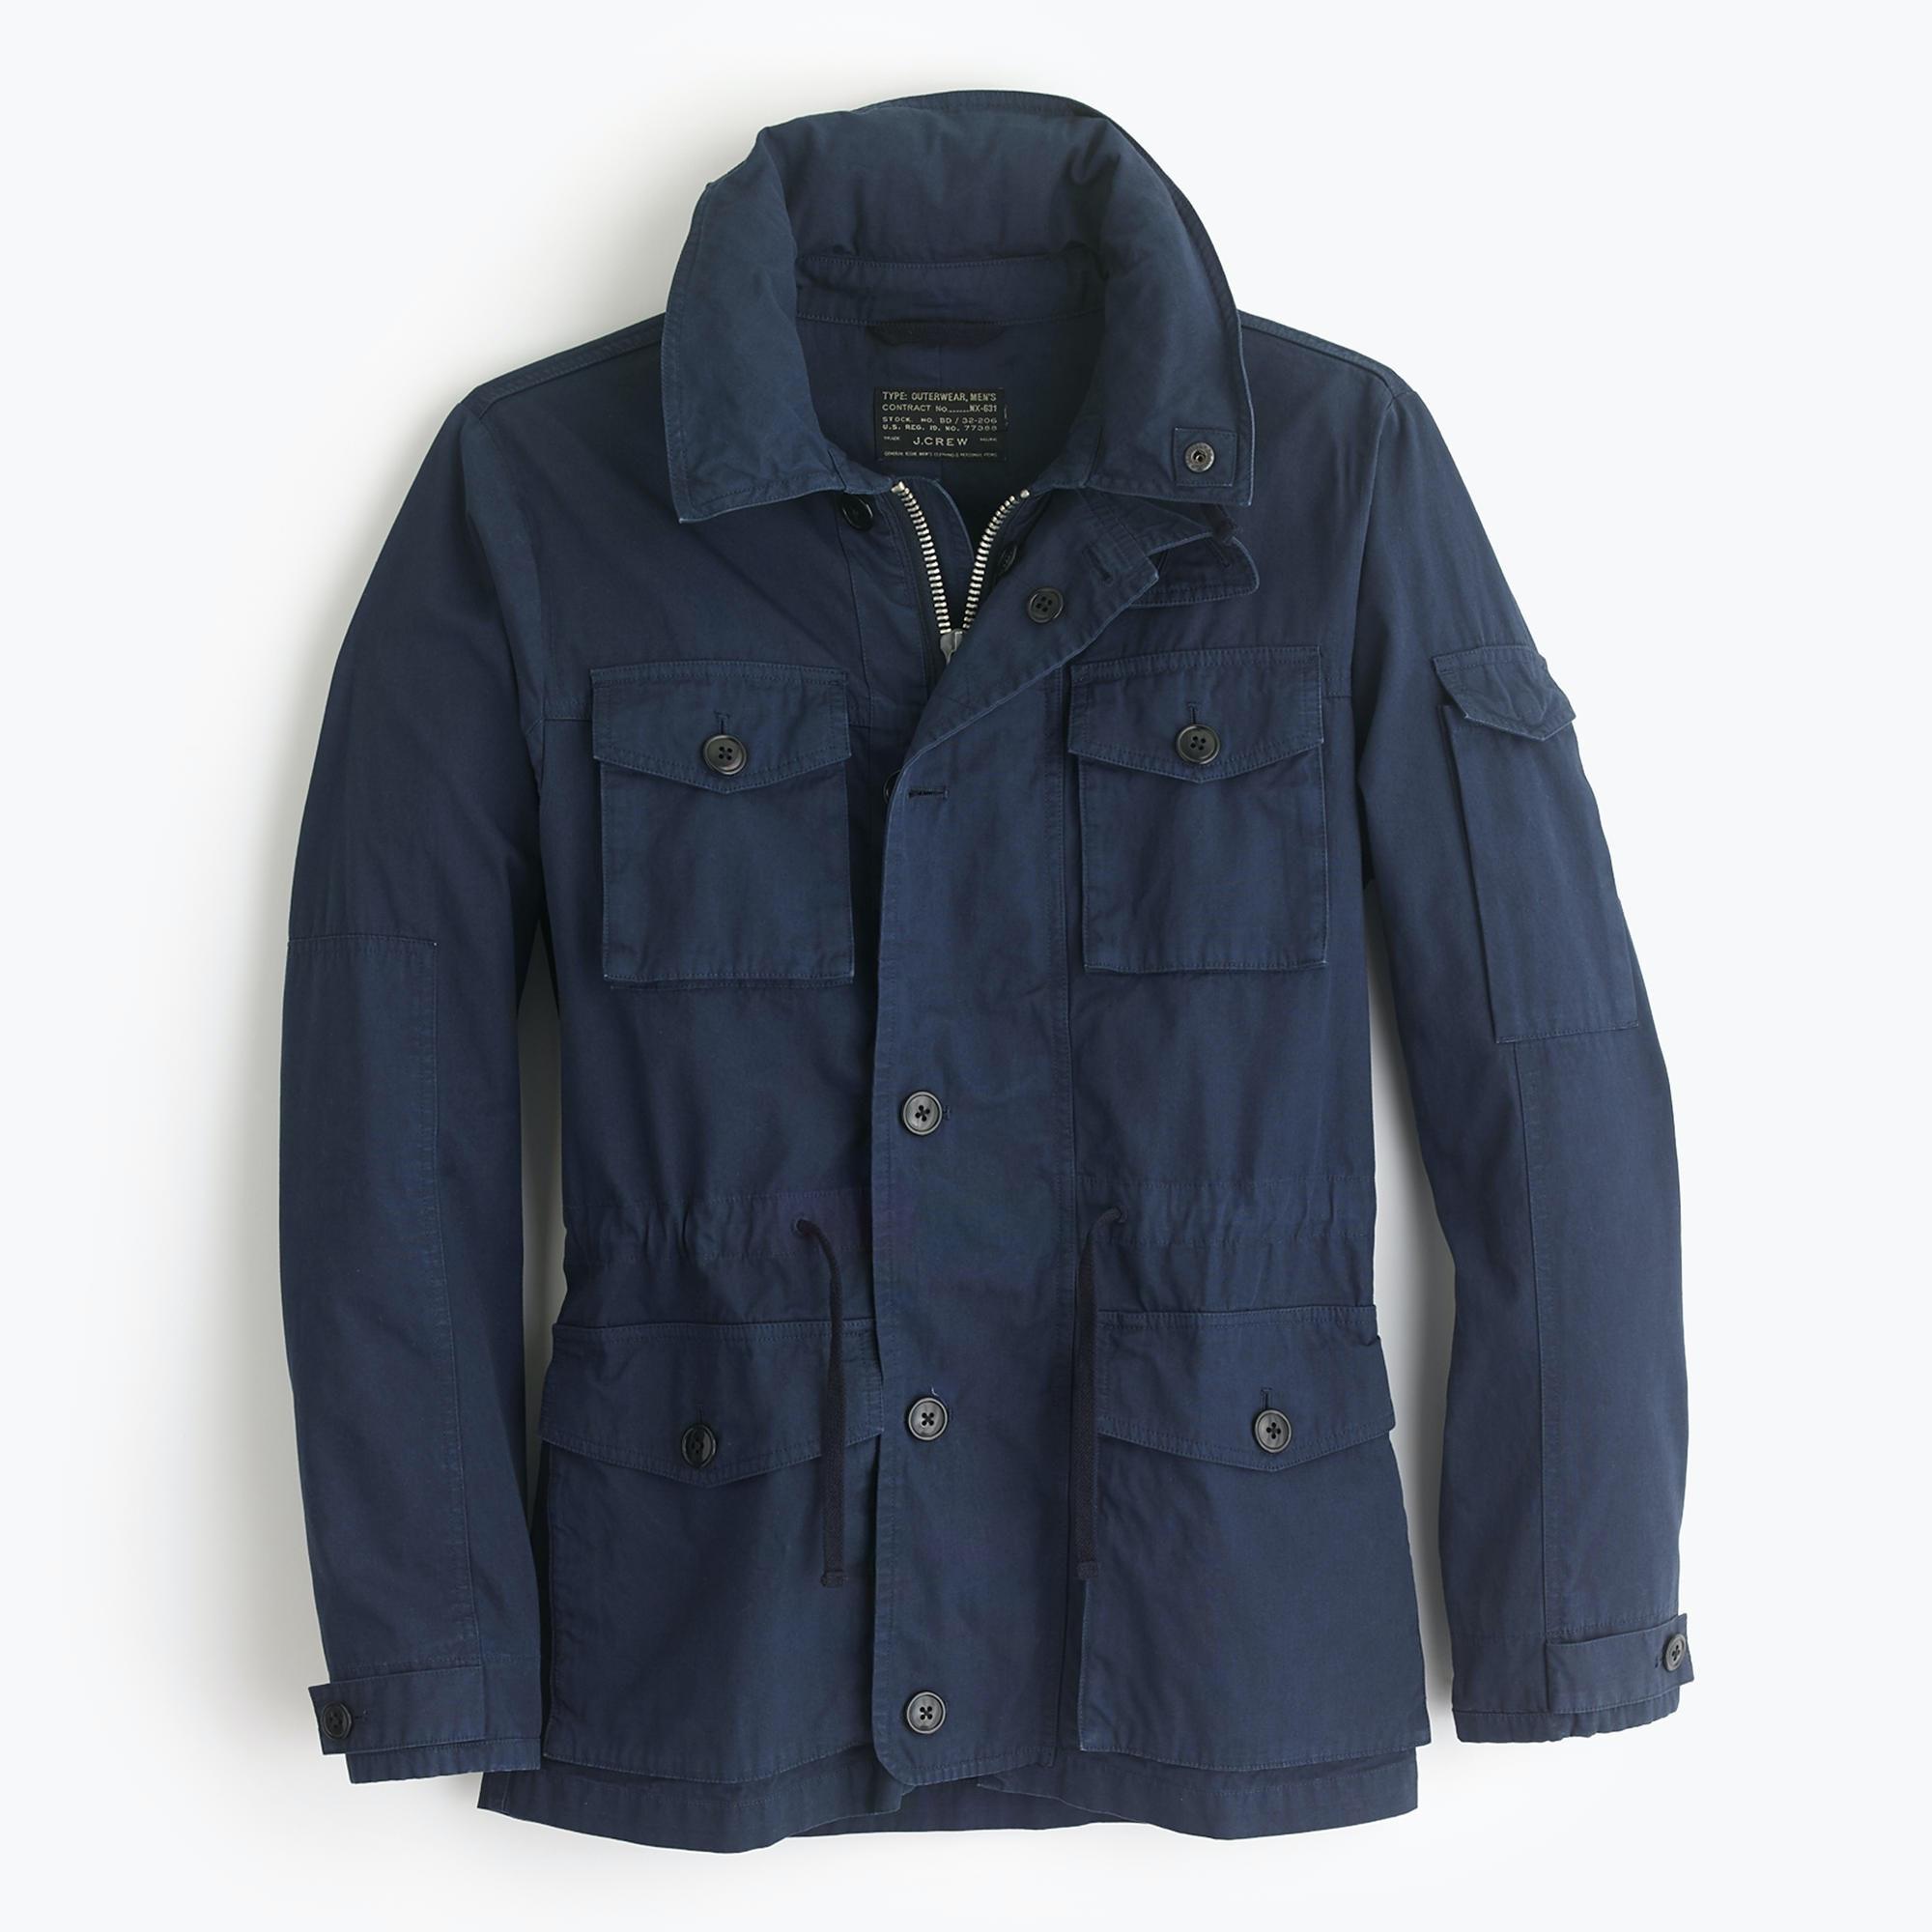 Field Mechanic Jacket : Men's Coats & Jackets | J.Crew